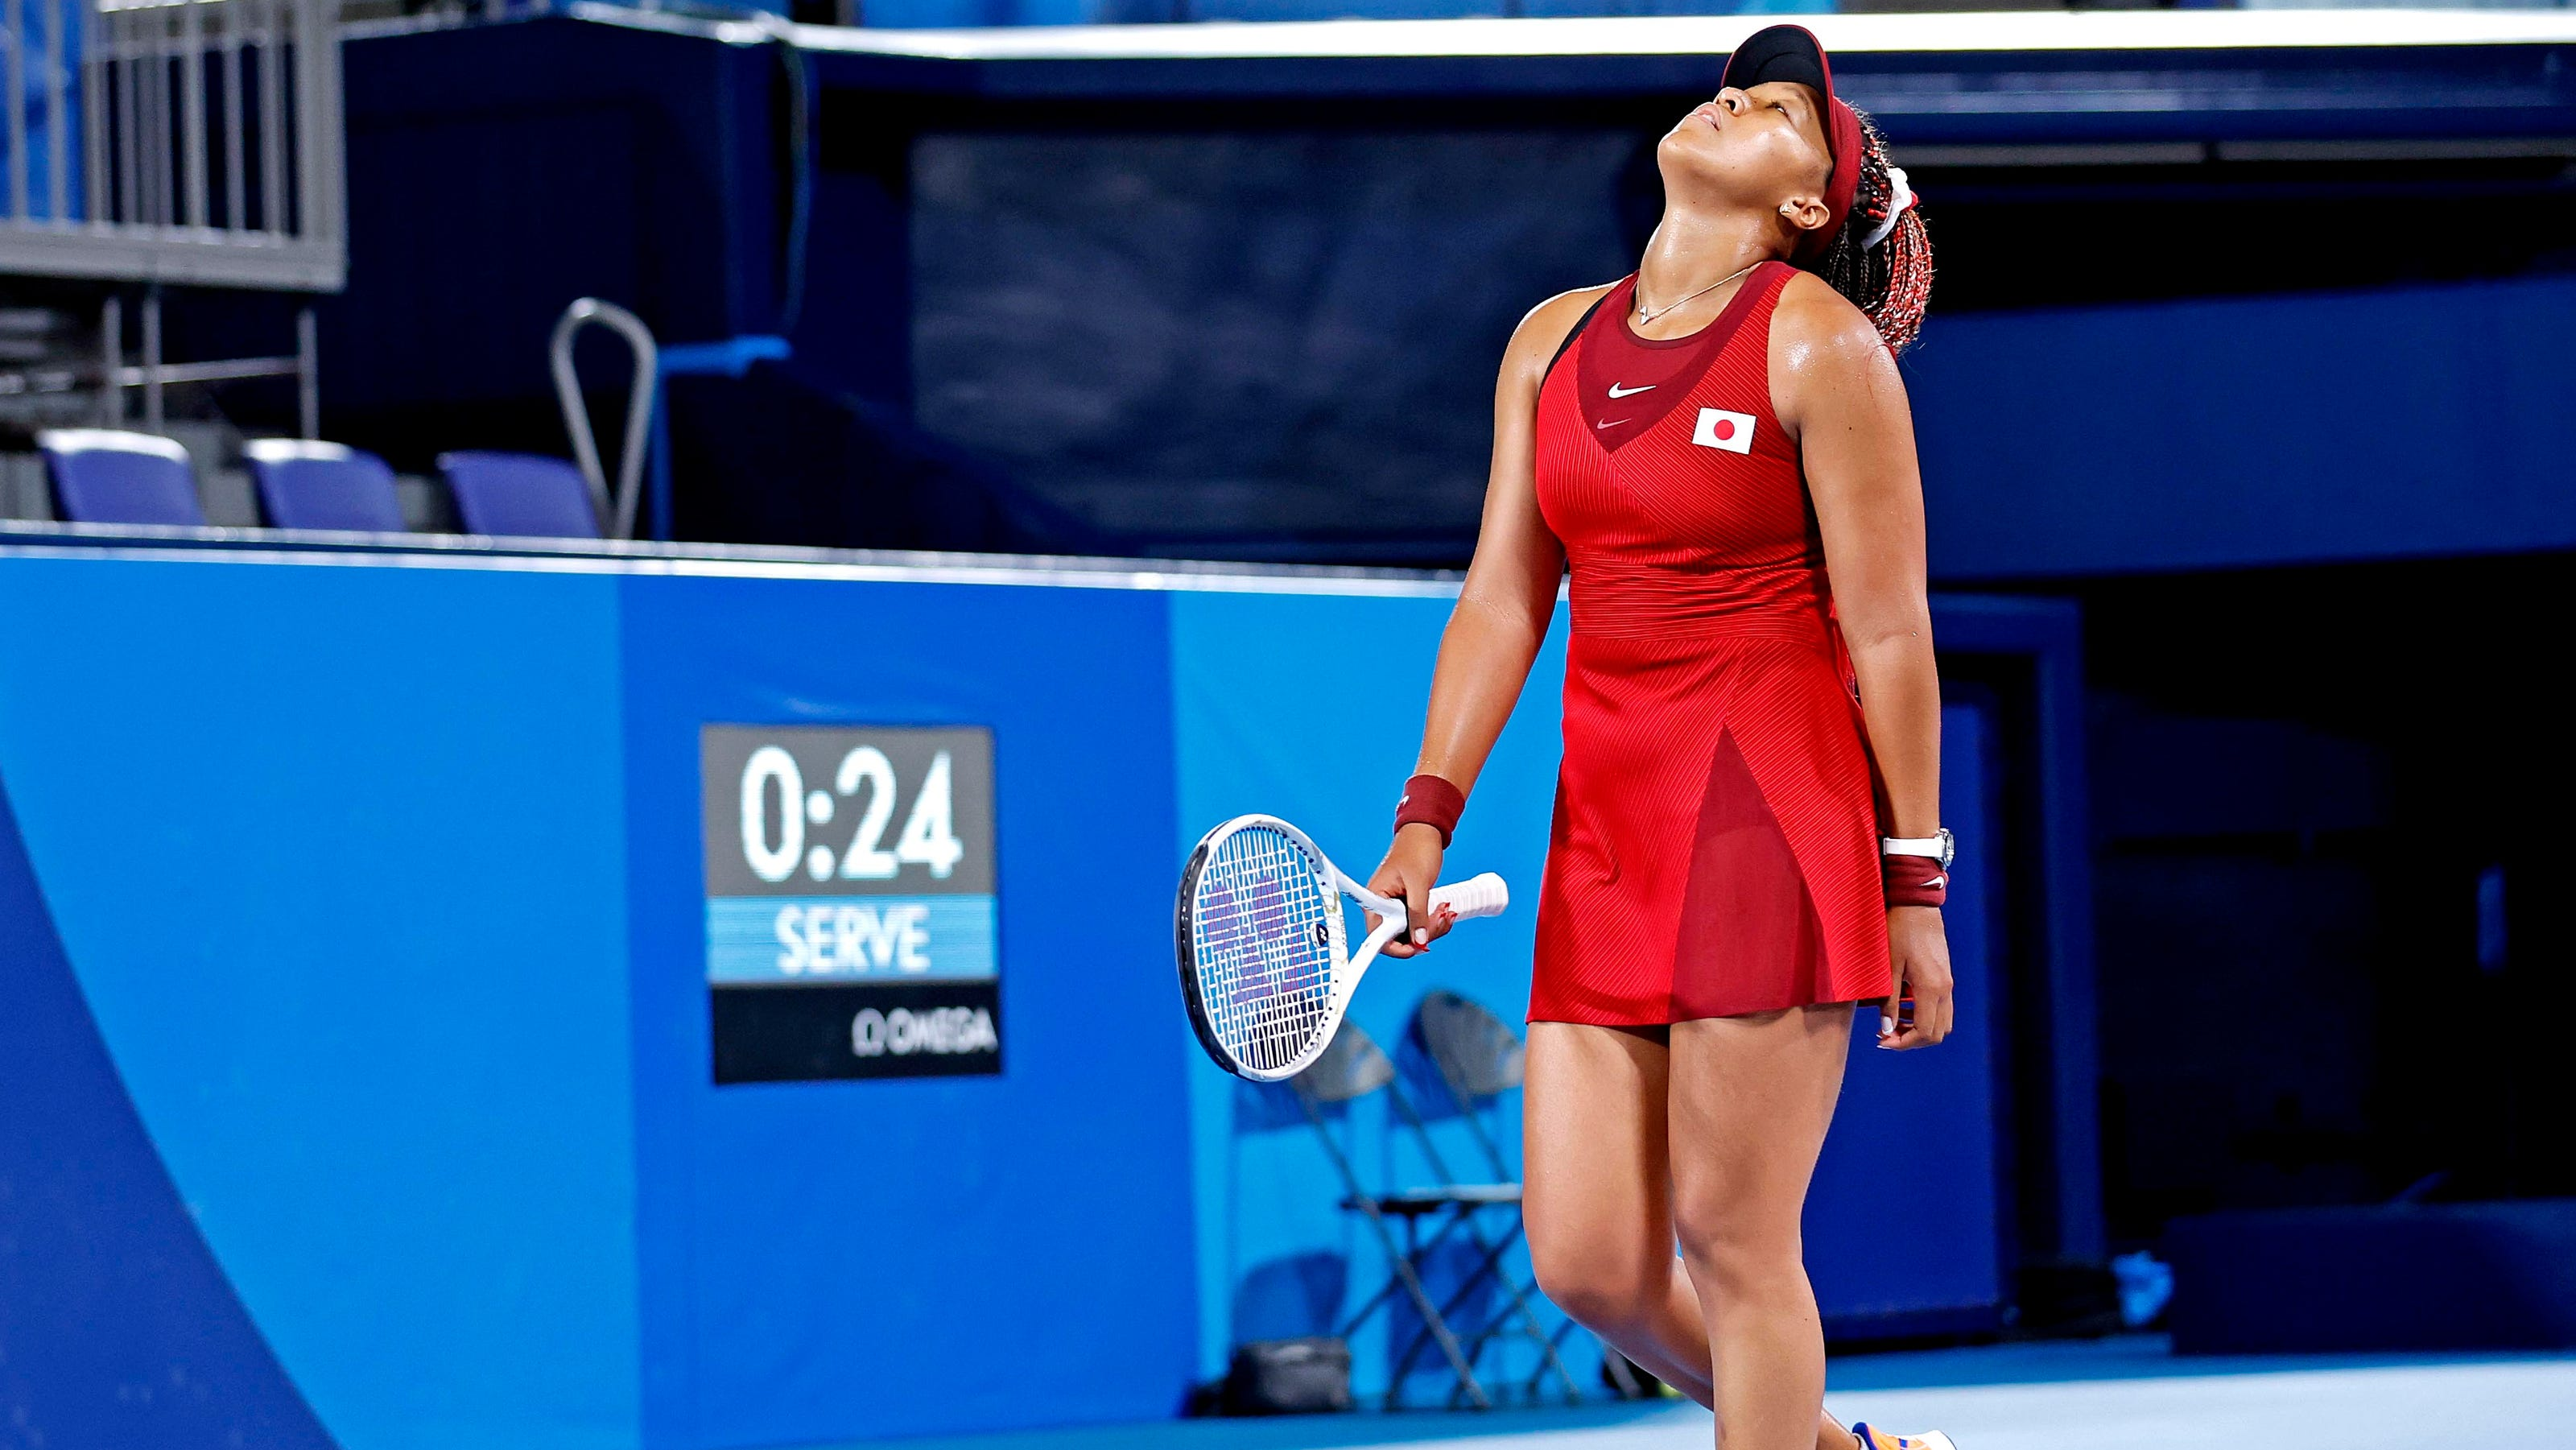 Naomi Osaka upset by Marketa Vondrousova in third-round Olympics women's tennis match